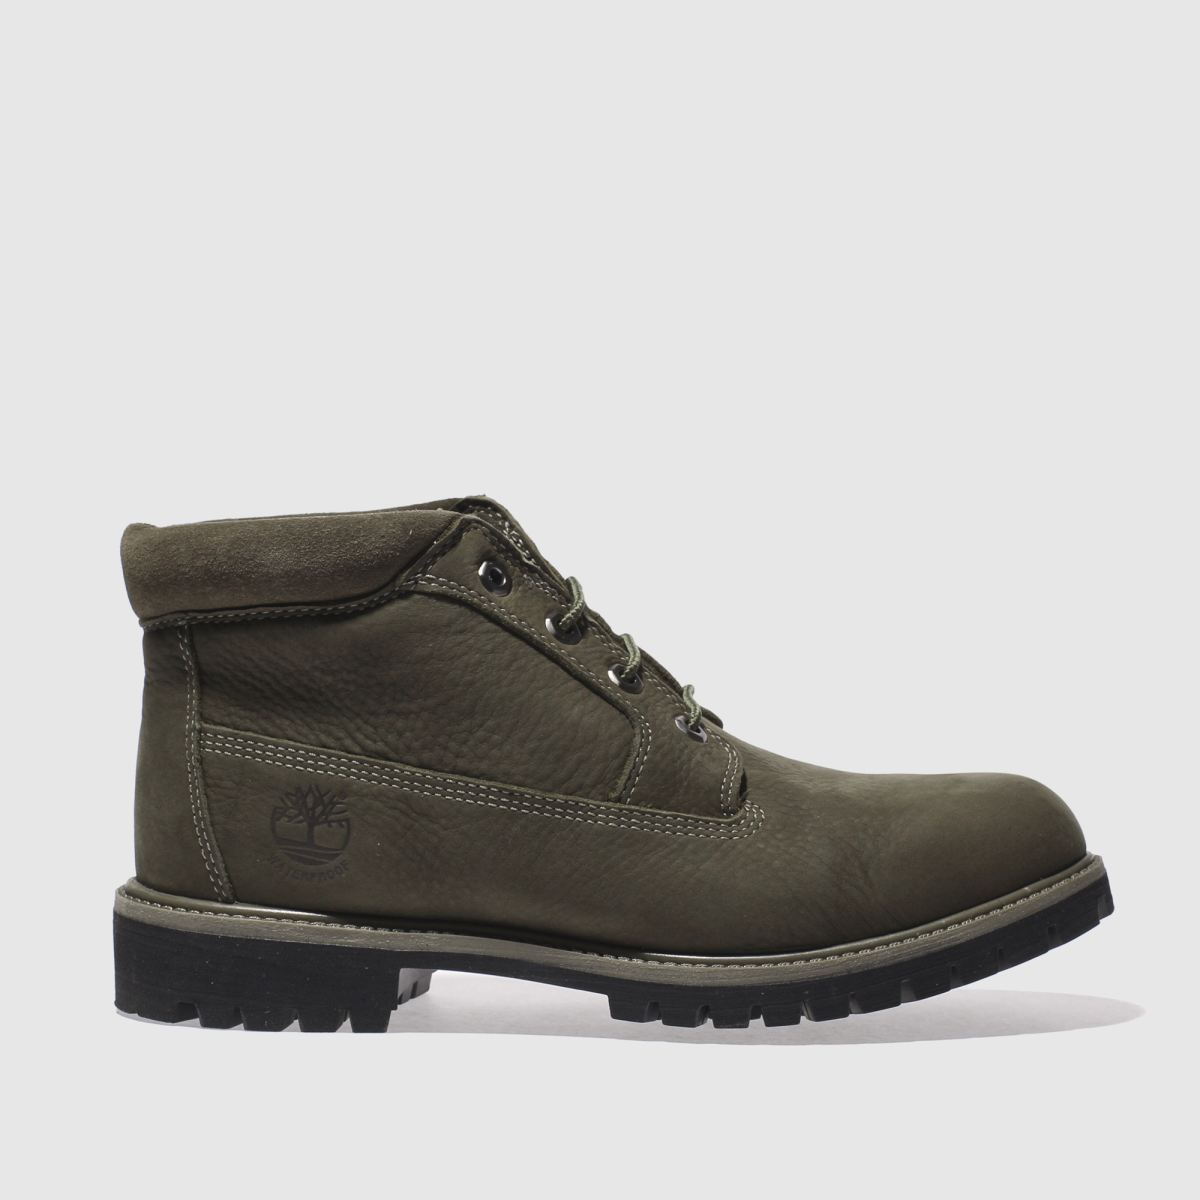 timberland khaki waterproof chukka boots